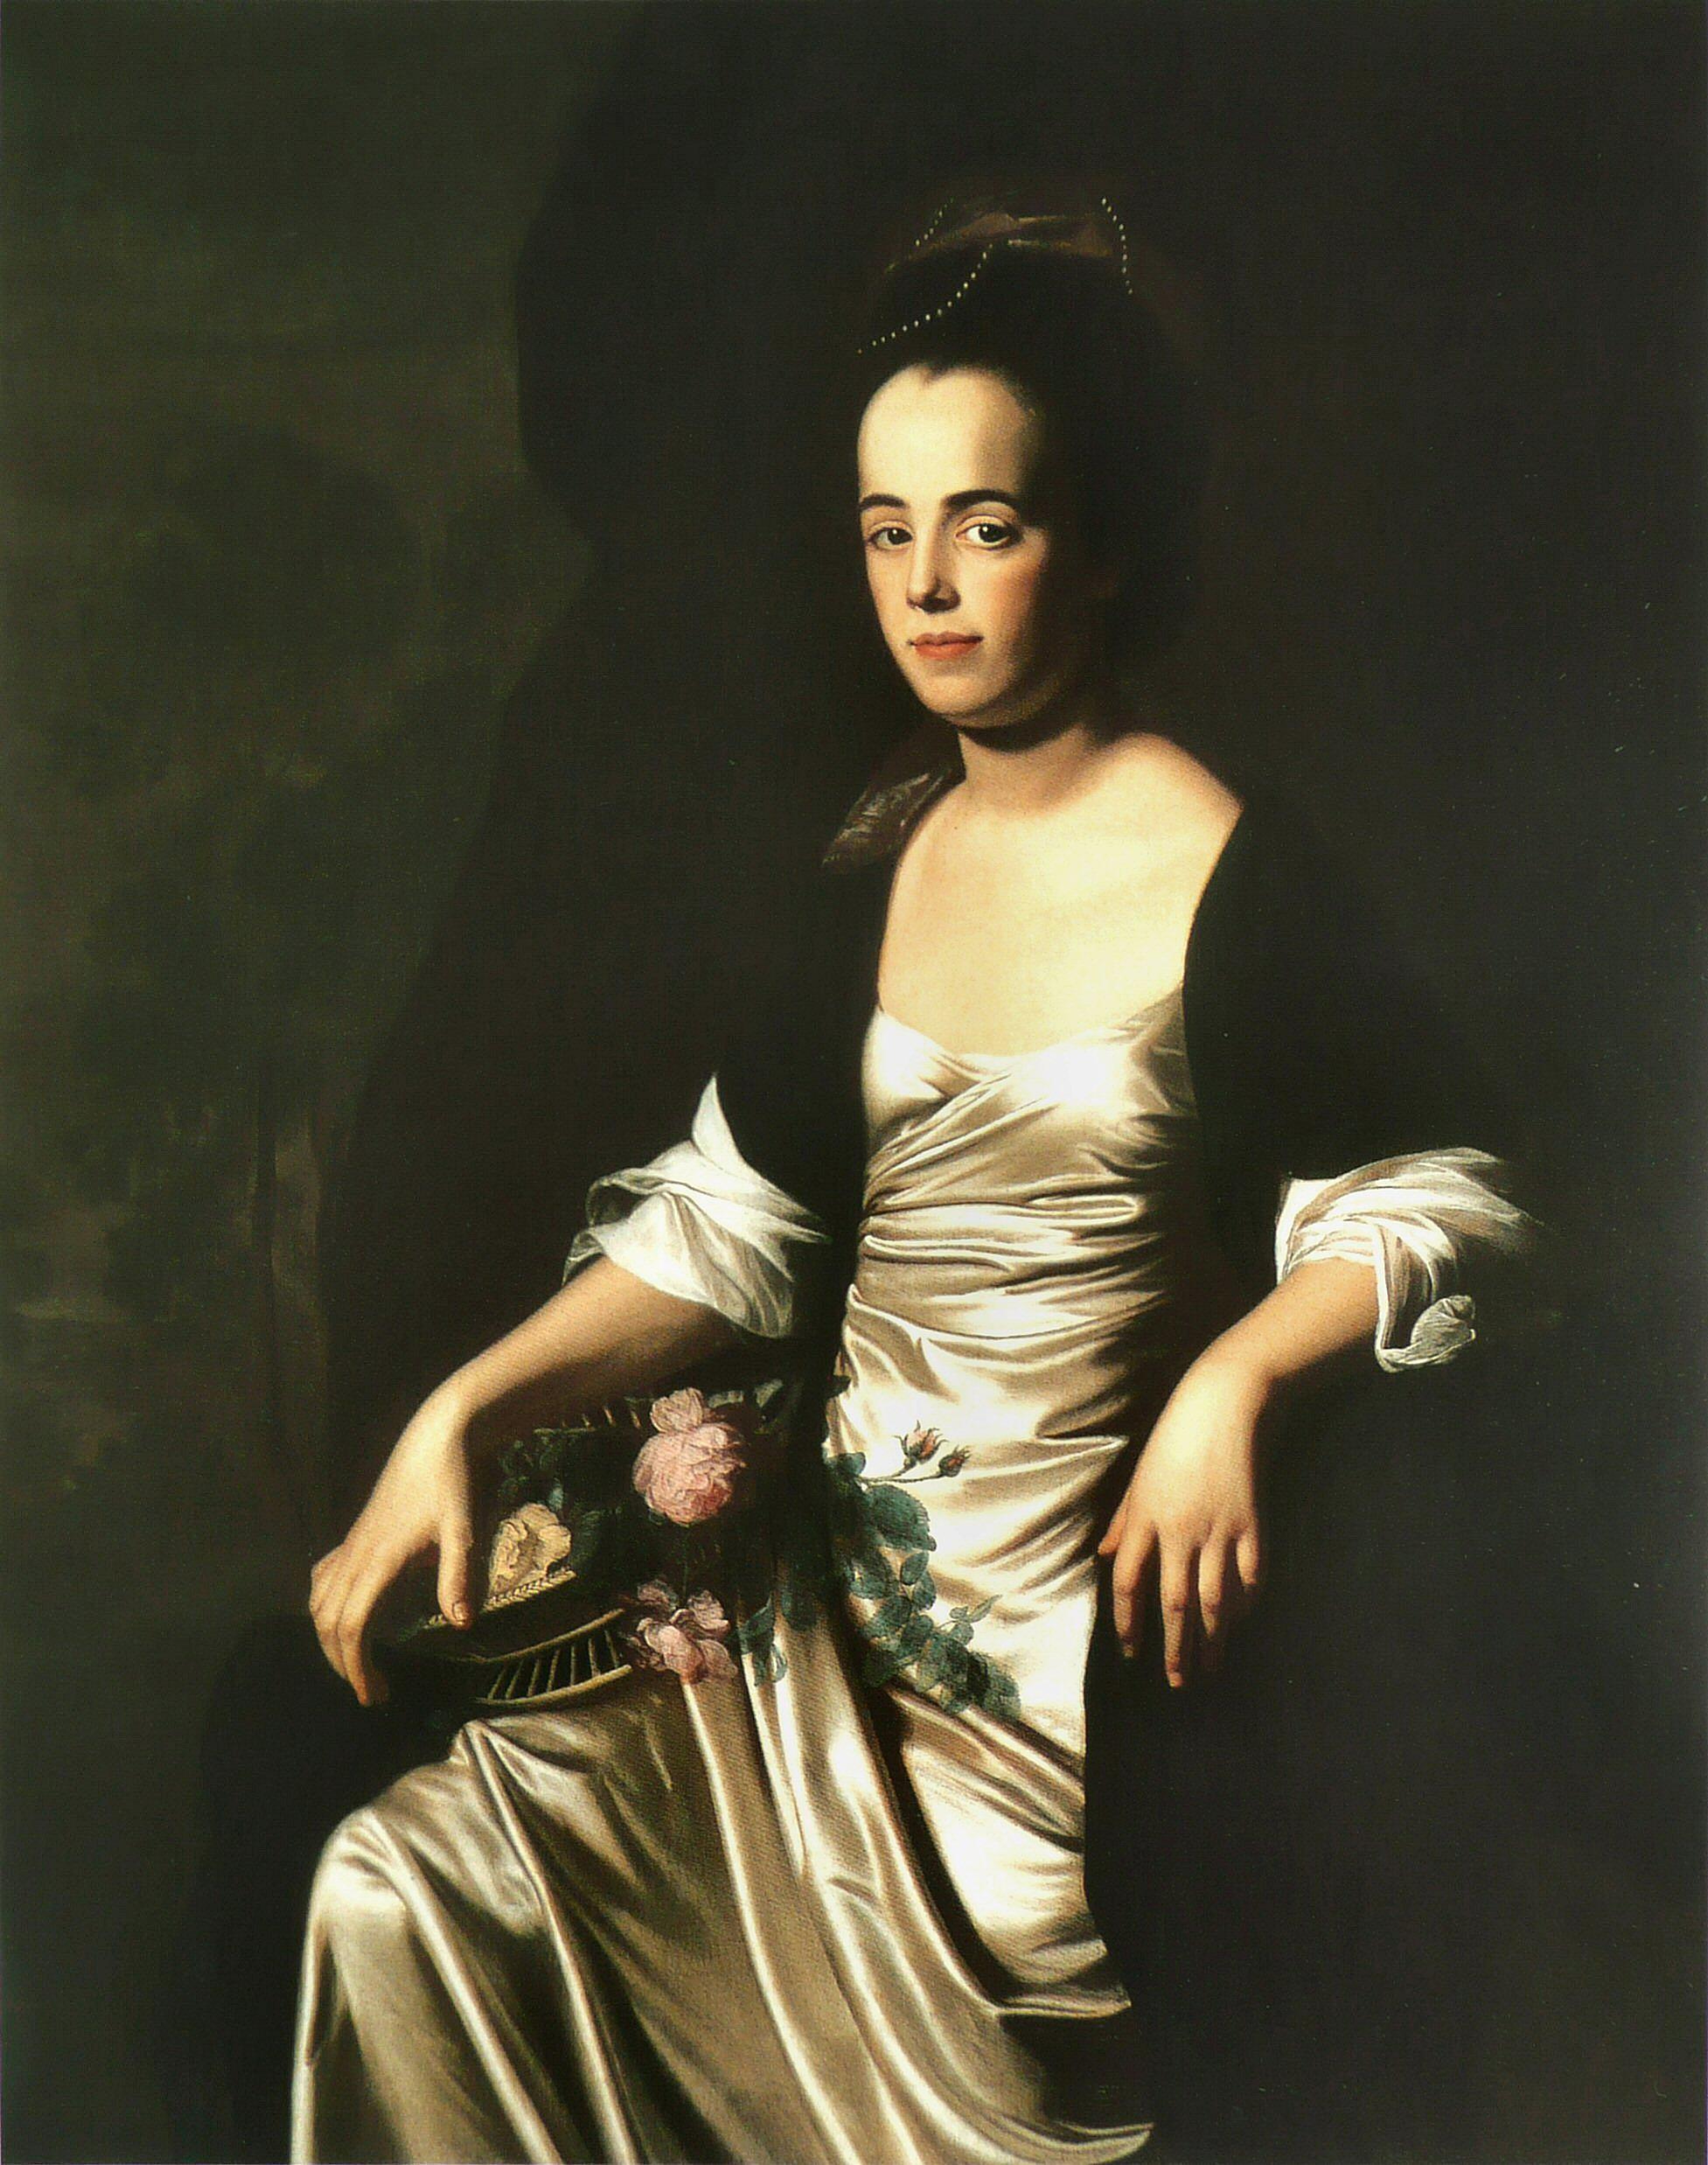 Portrait of Judith Sargent Murray by John Singleton Copley, ca. 1770-1772.